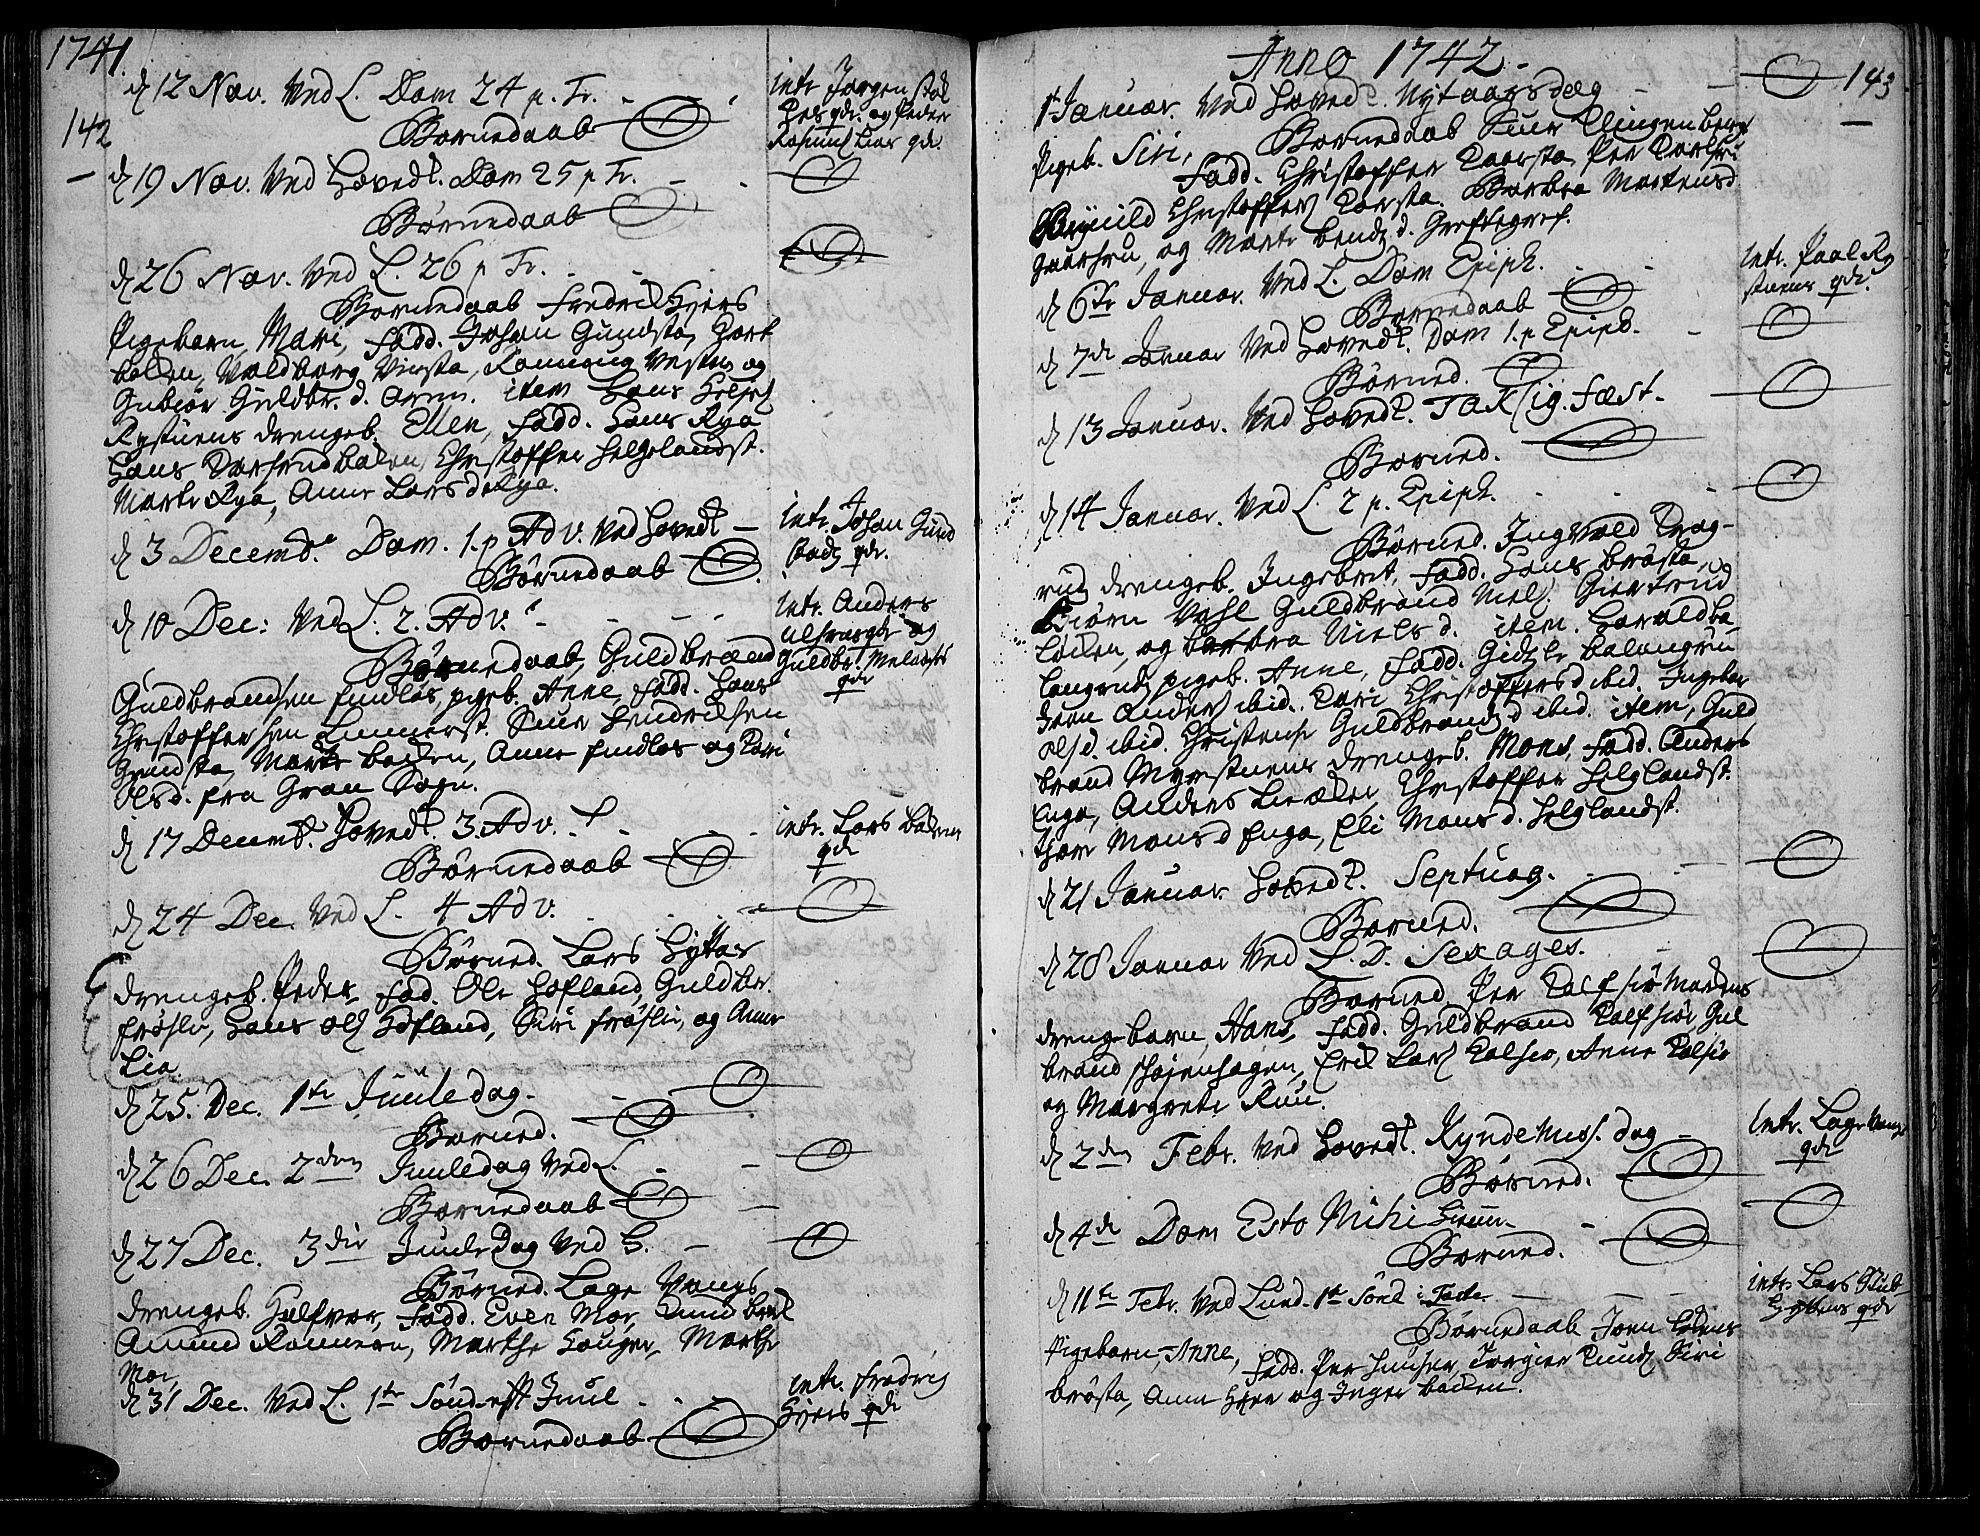 SAH, Jevnaker prestekontor, Ministerialbok nr. 2, 1725-1751, s. 142-143